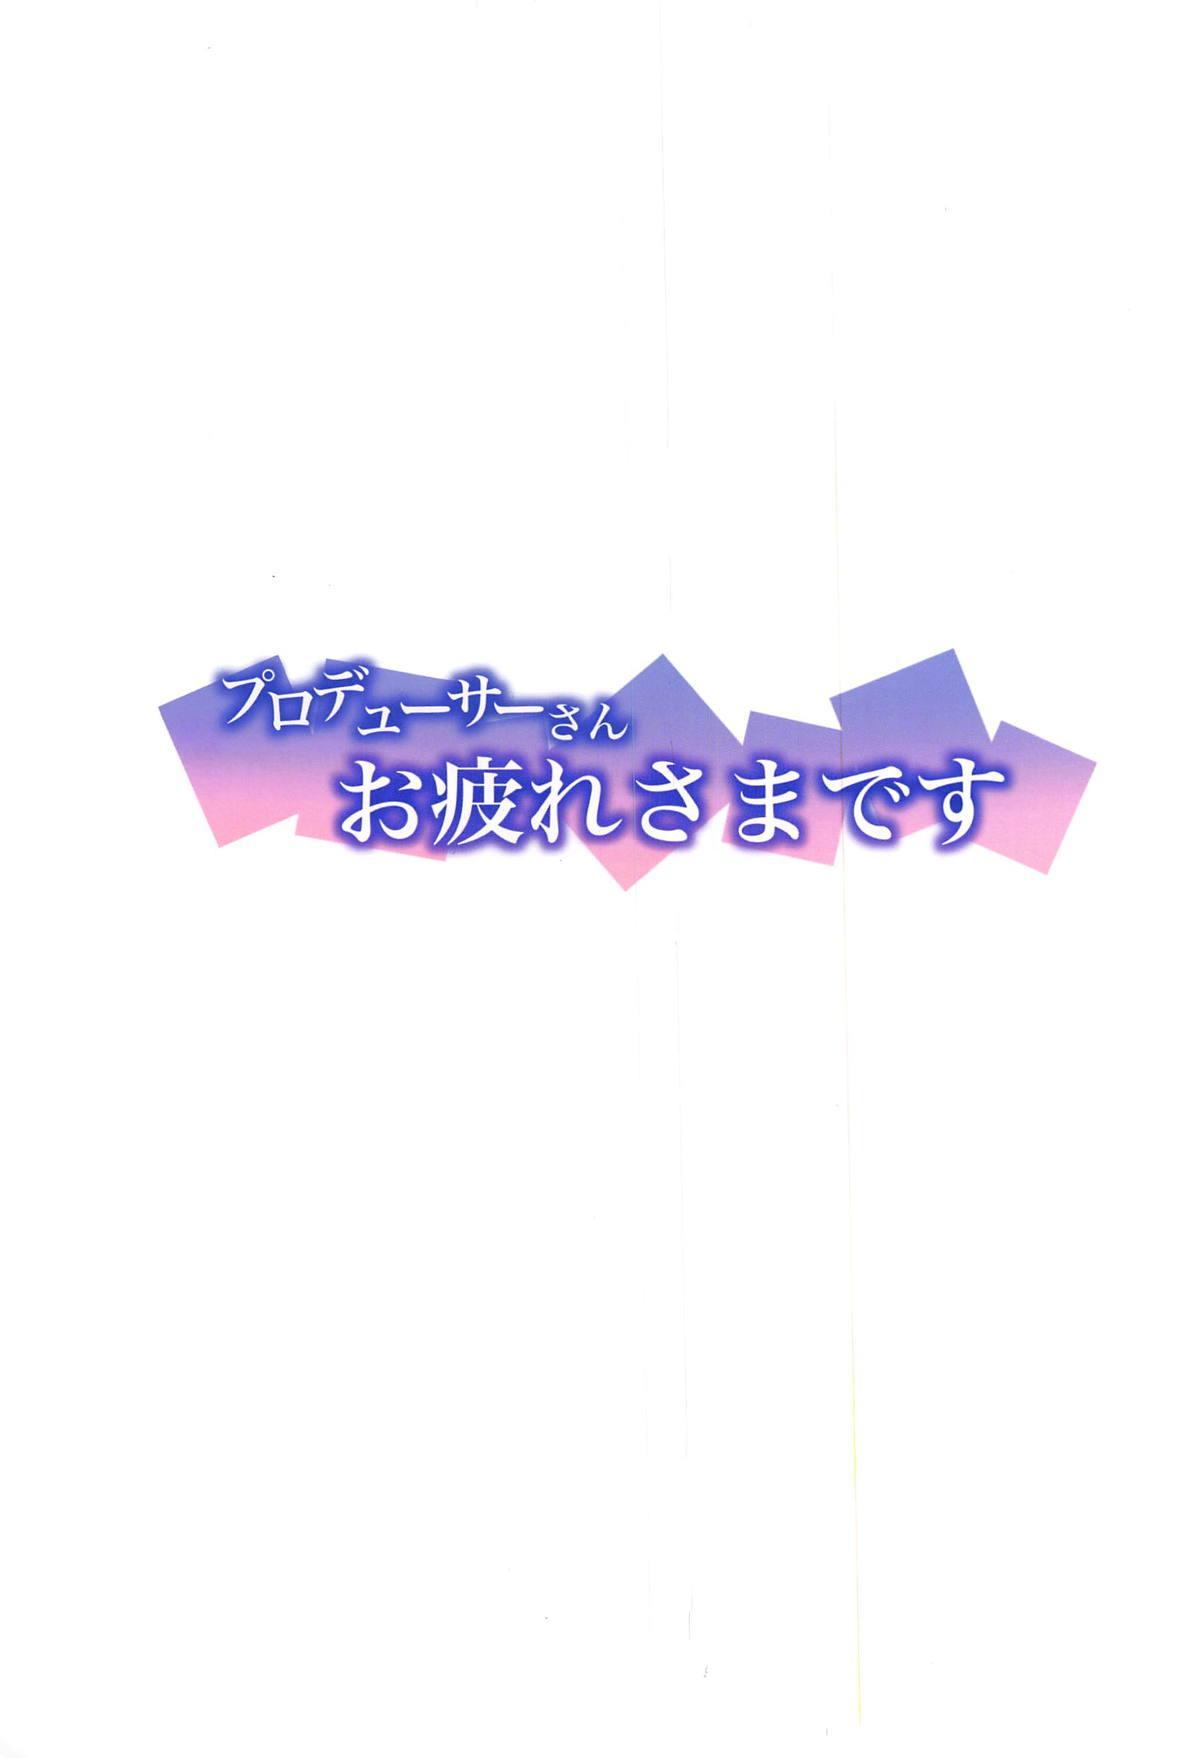 Producer-san Otsukaresama desu 1